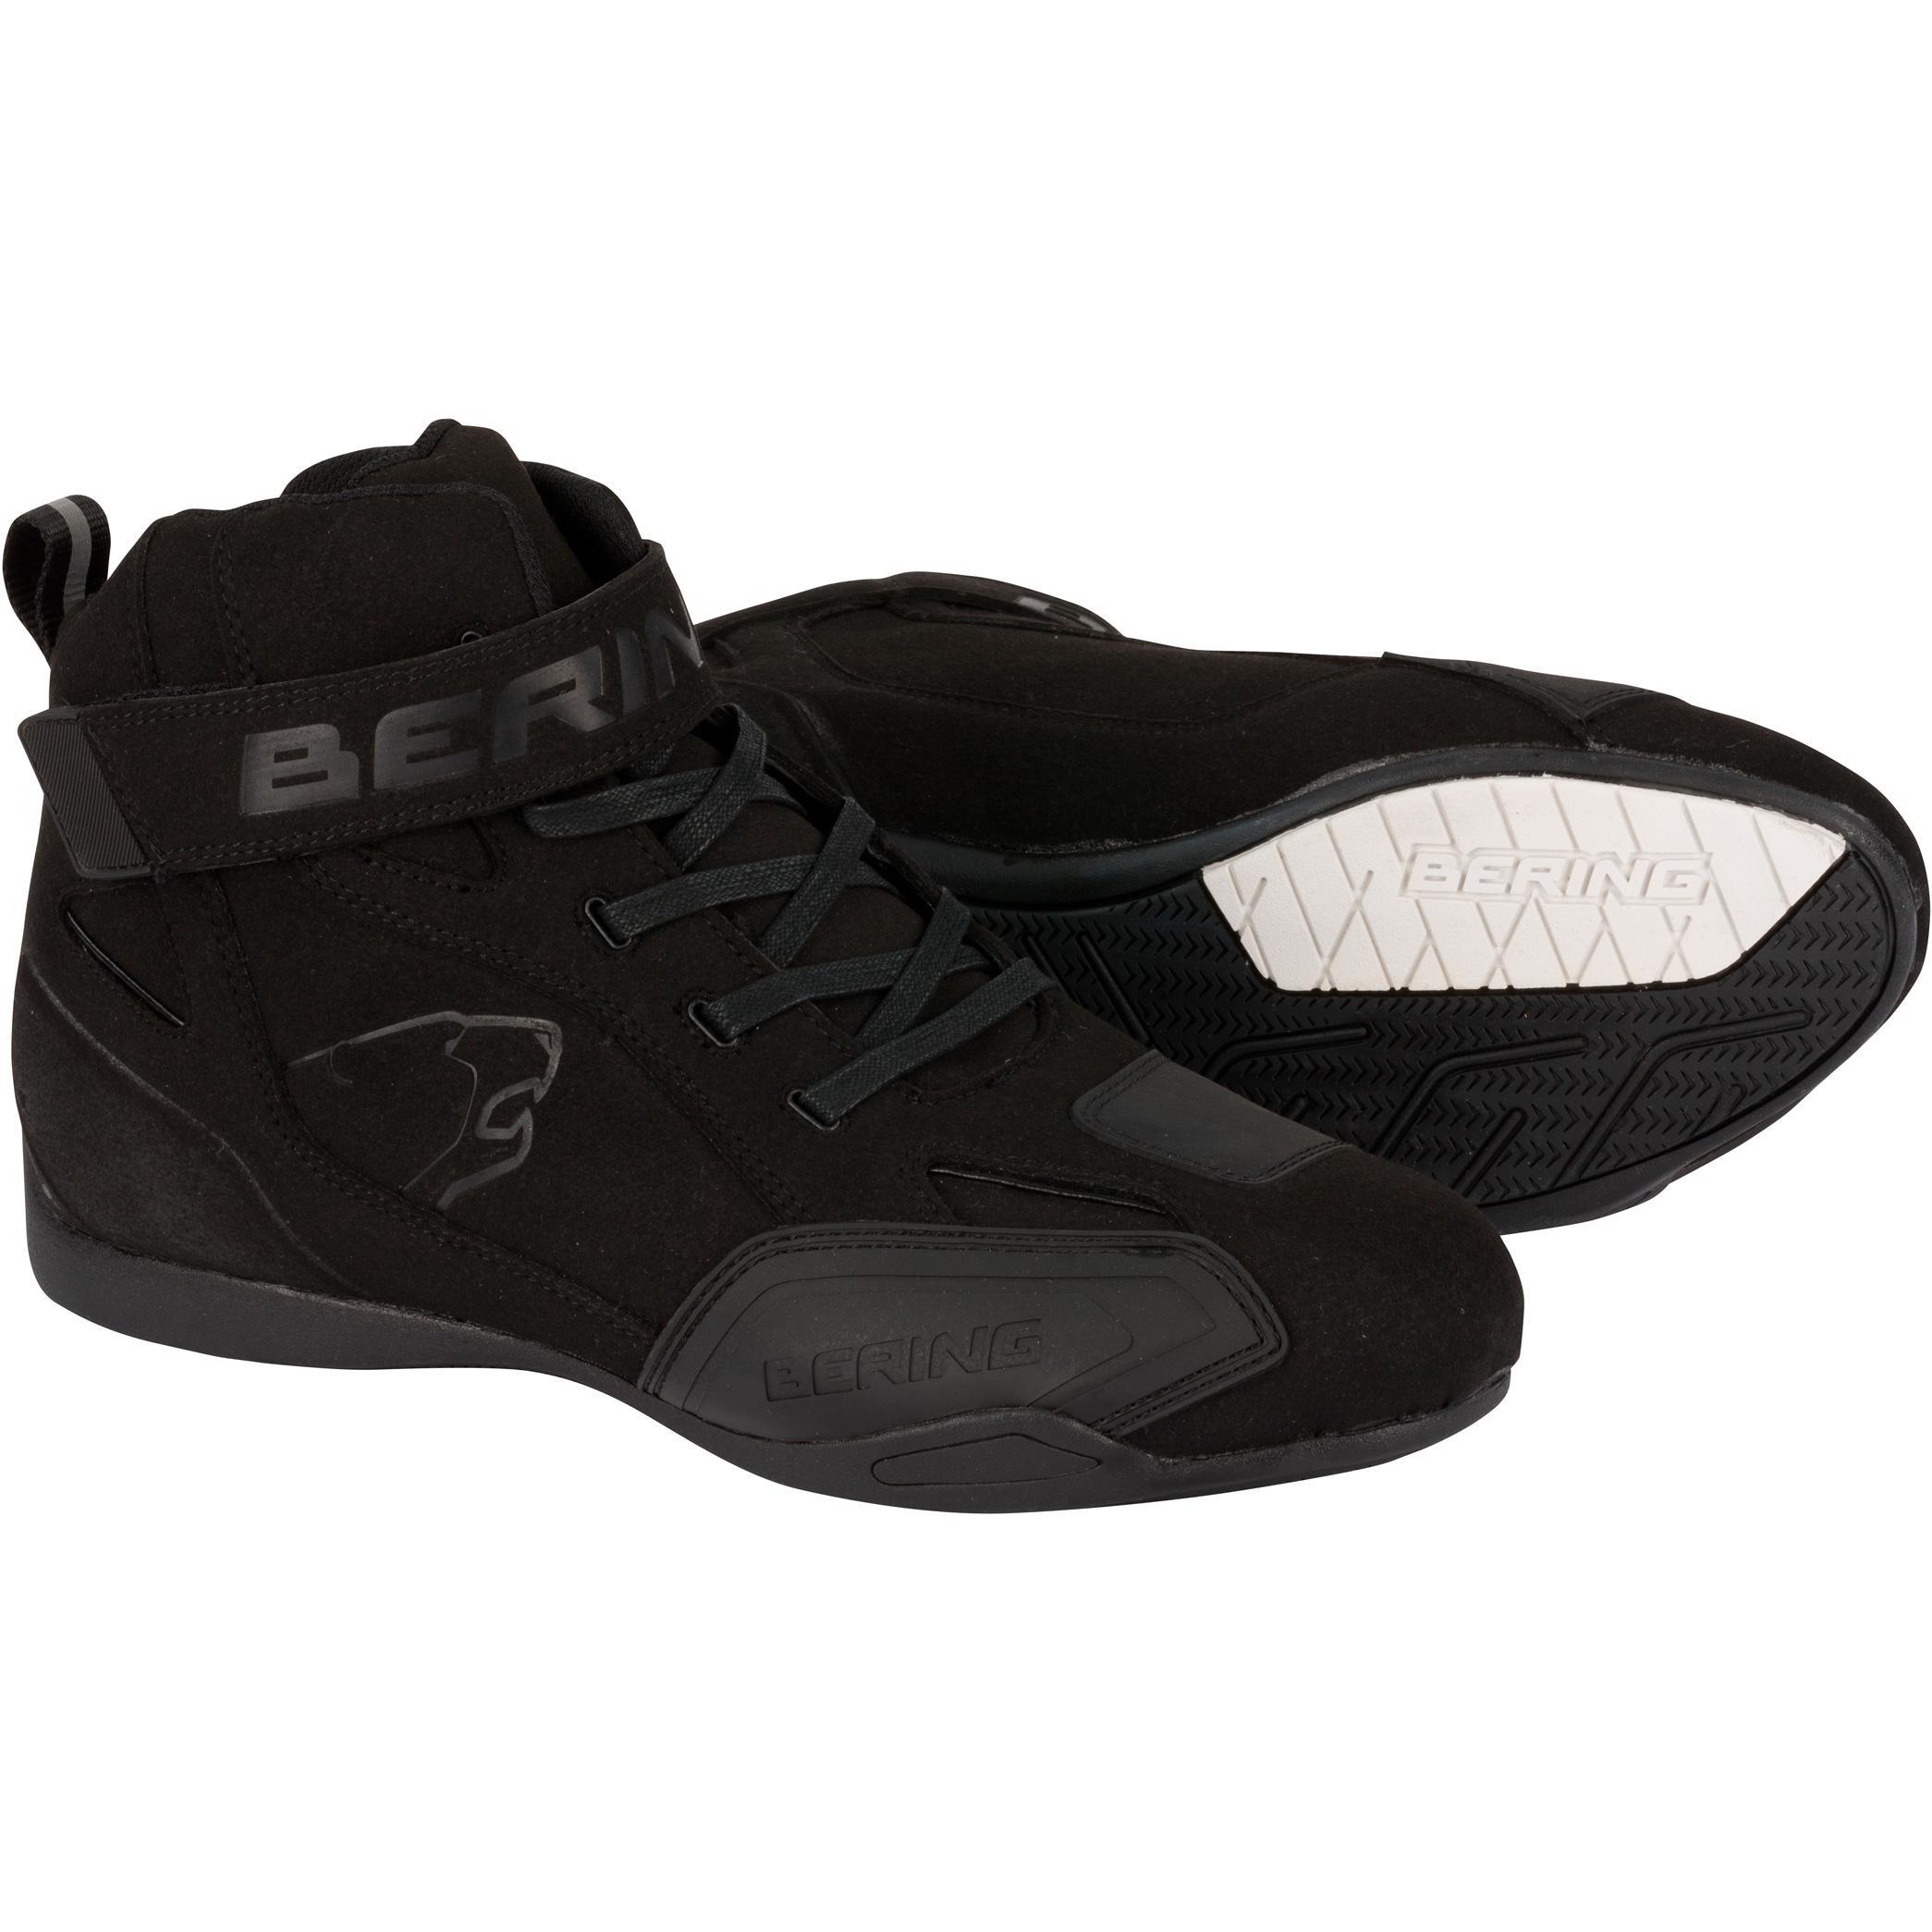 BERING-baskets-corwell-image-10685685